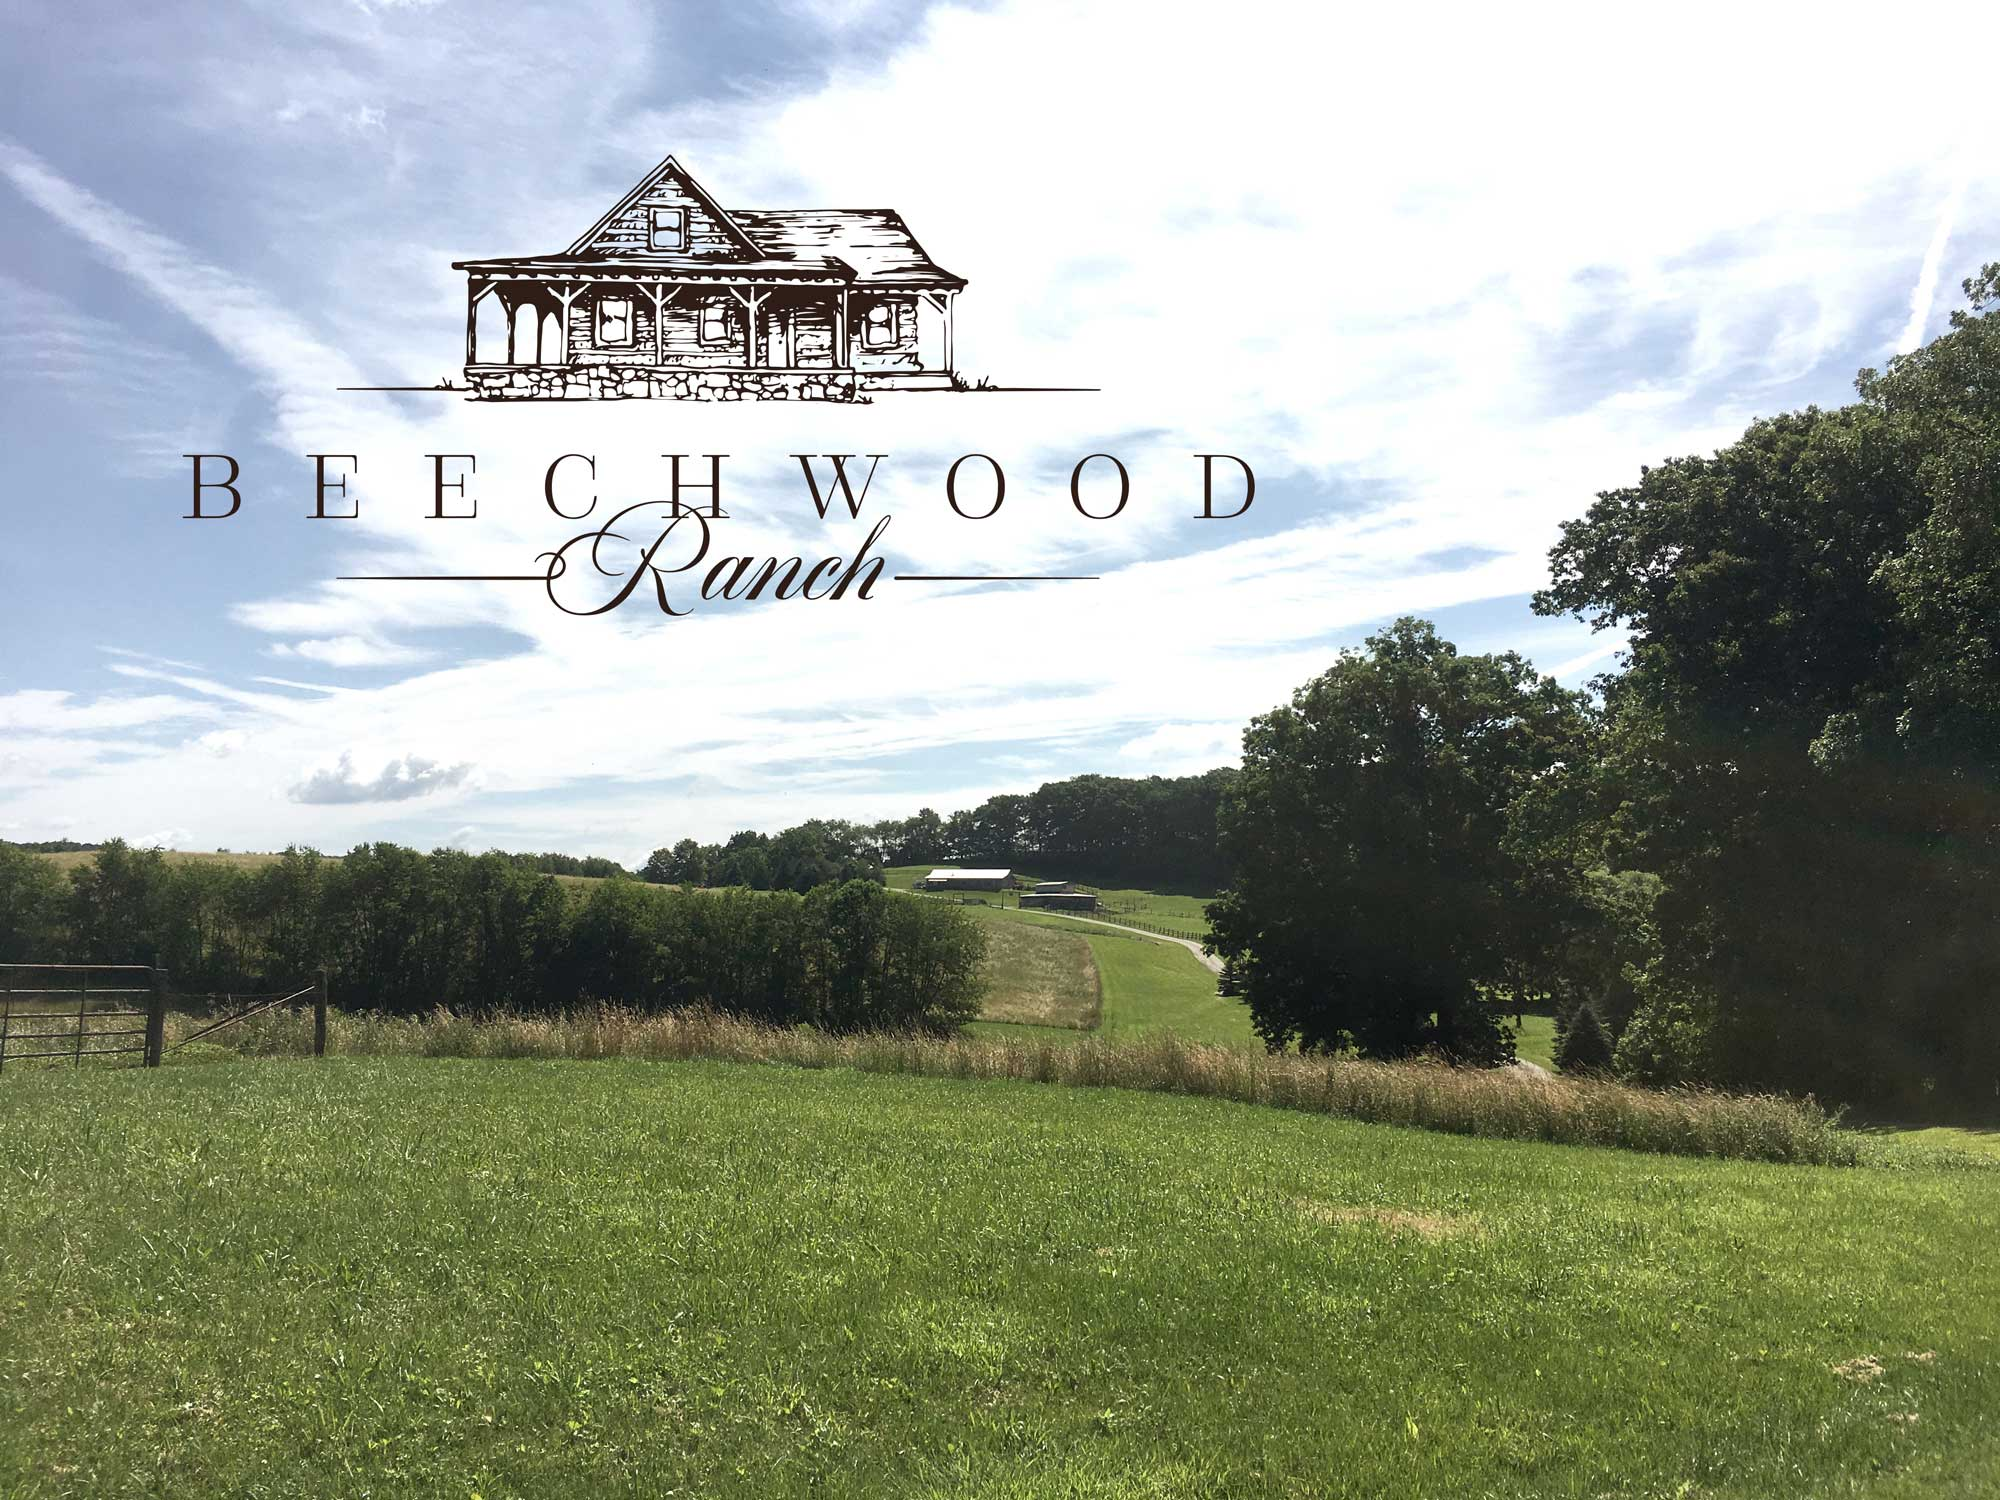 Beechwood-ranch-logo.jpg